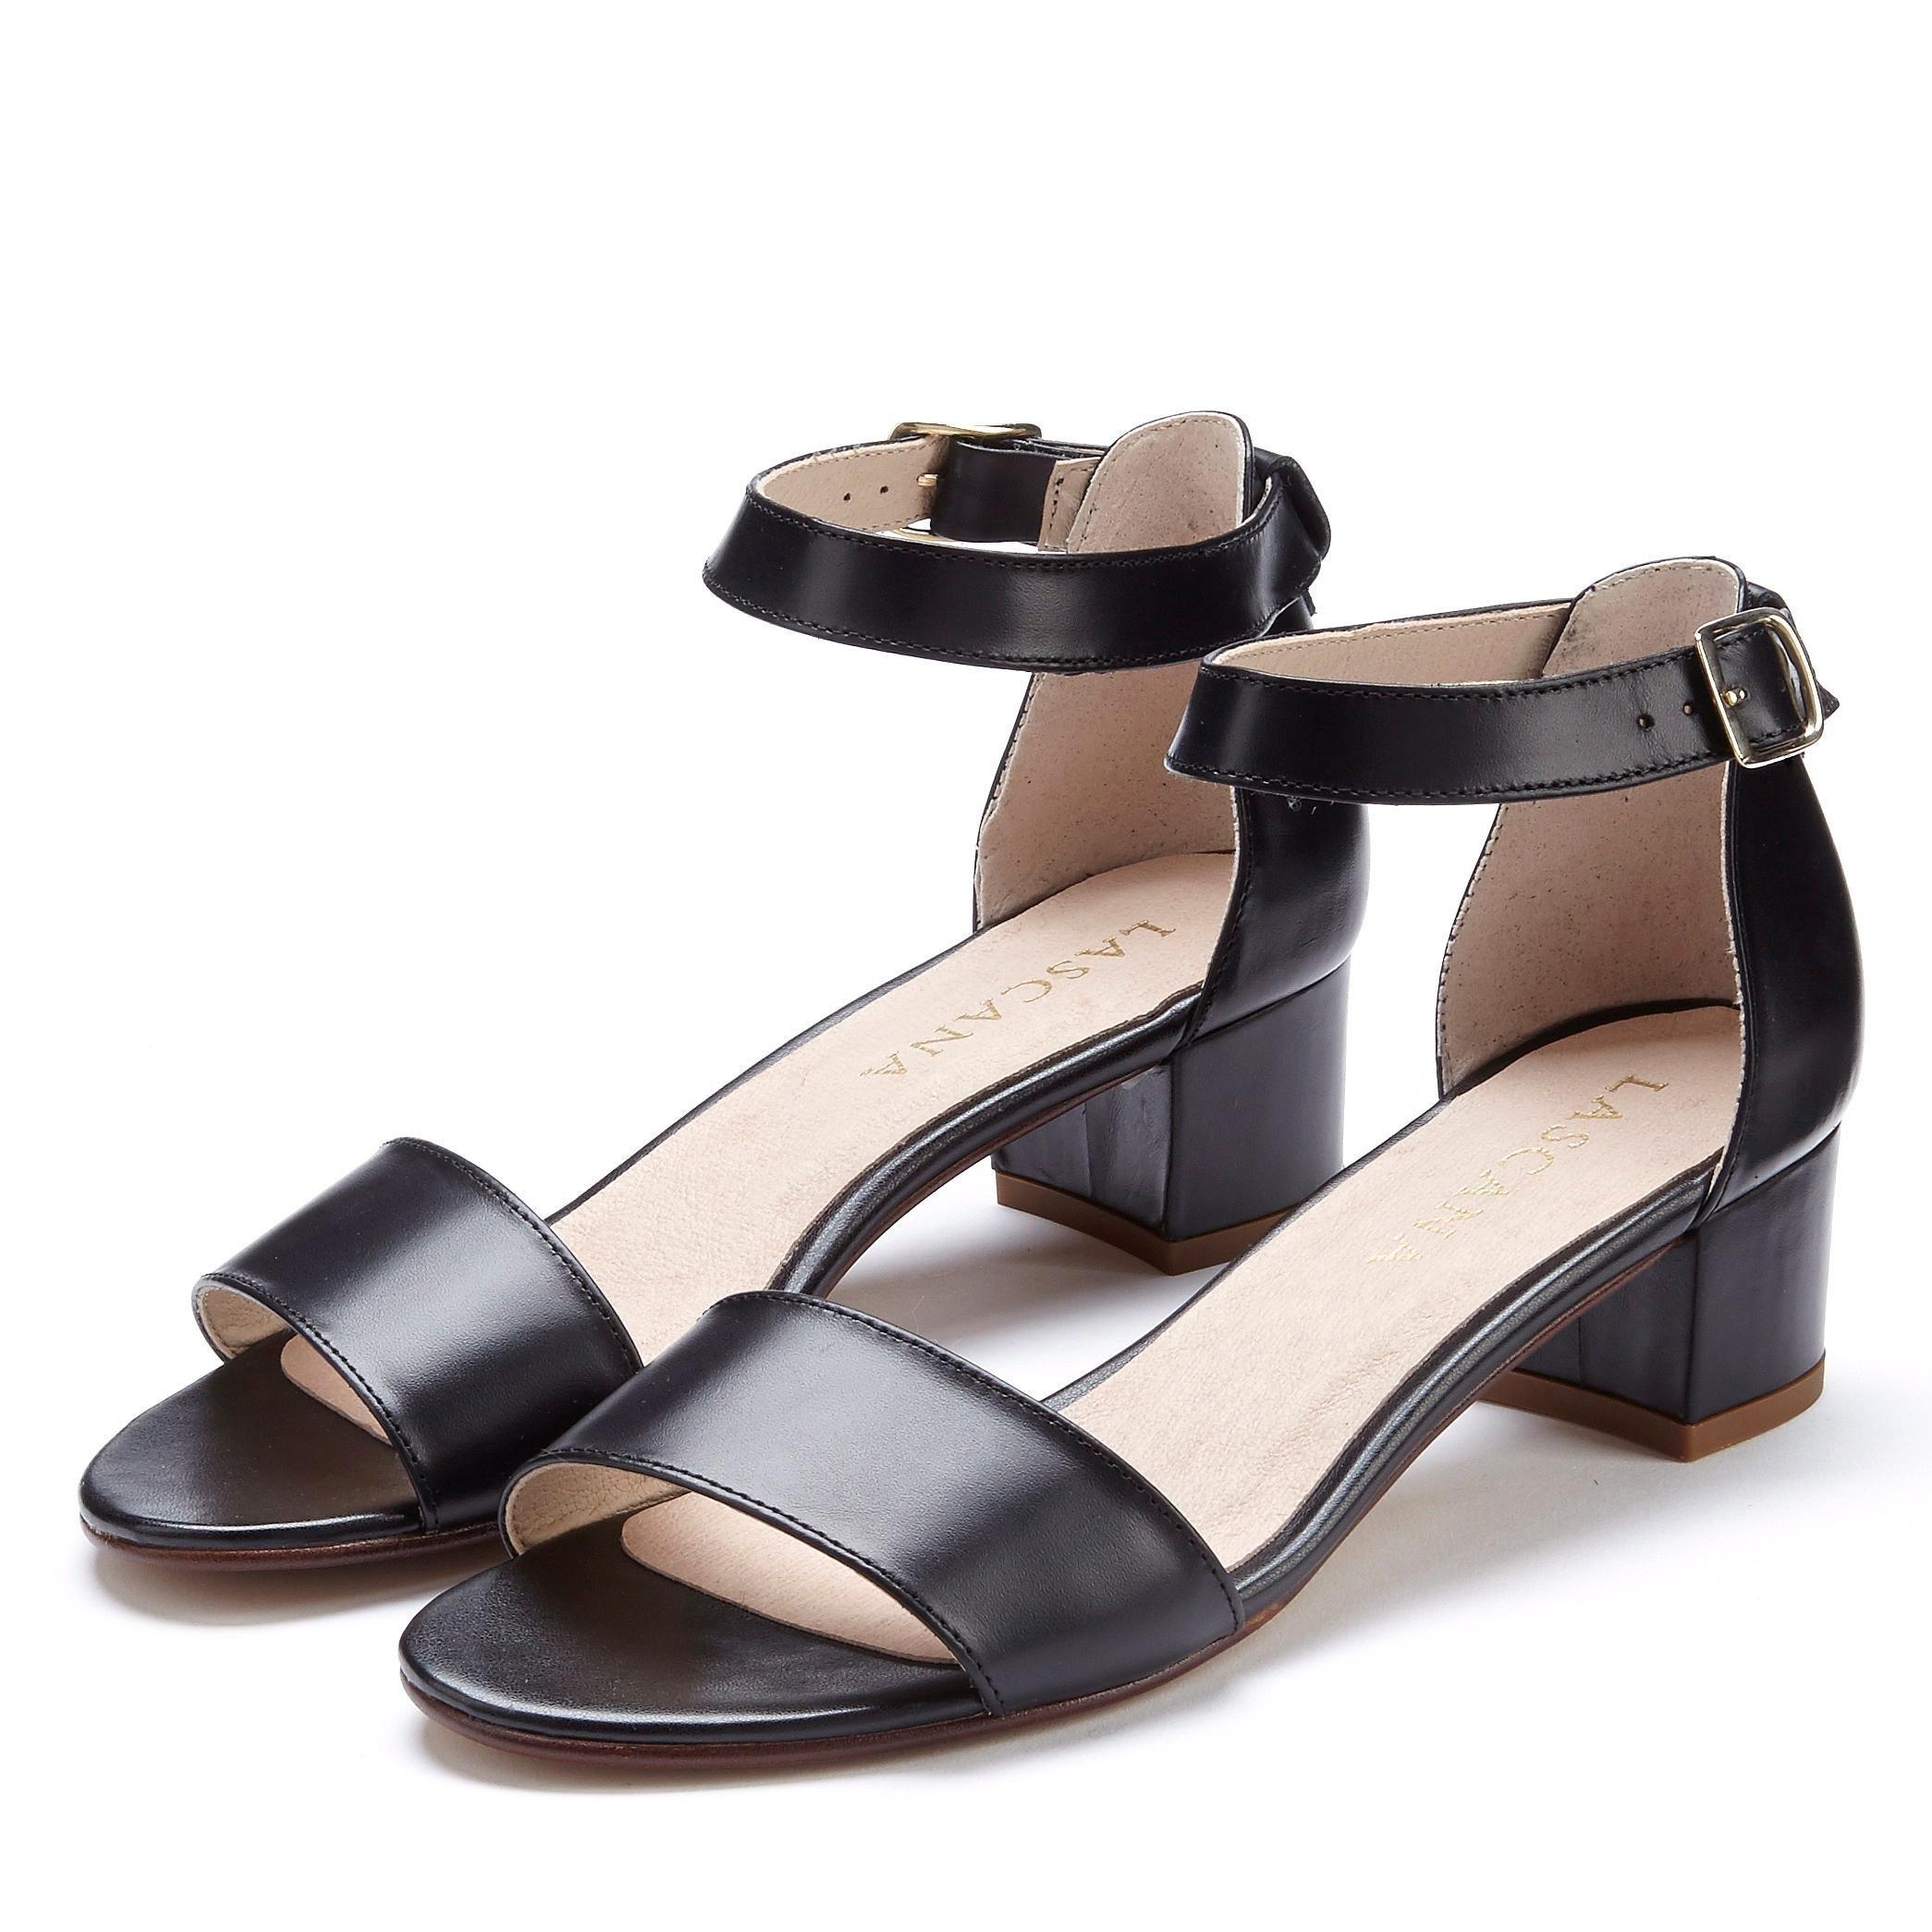 LASCANA sandaaltjes - gratis ruilen op lascana.nl